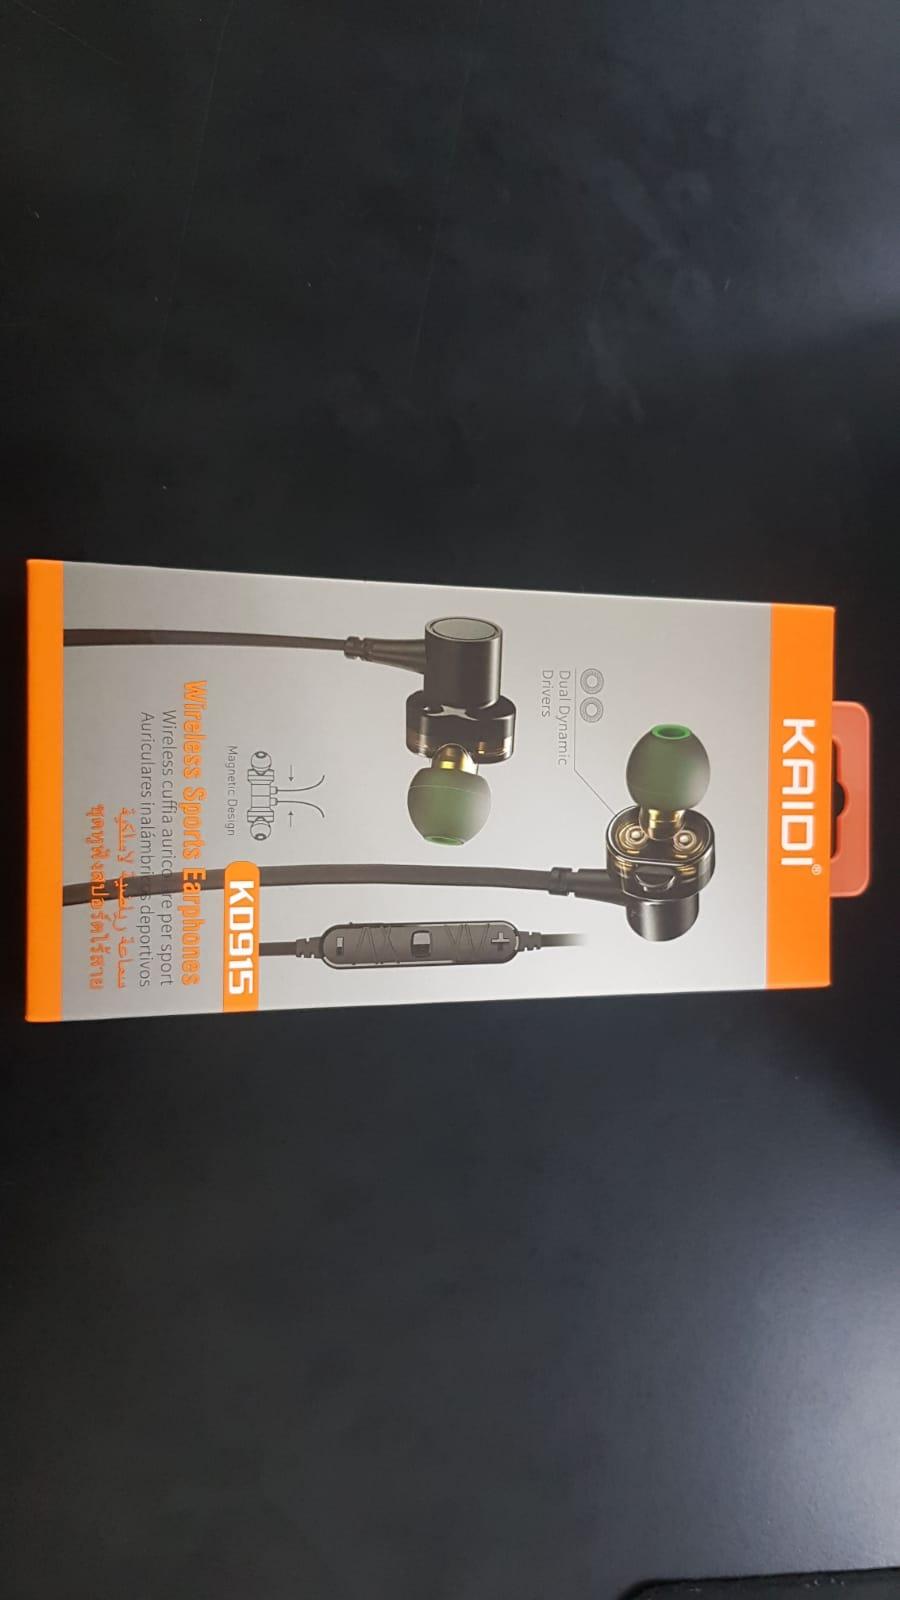 Fone de Ouvido Bluetooth Dual Dynamic Speakers Magnético KD915 - KAIDI